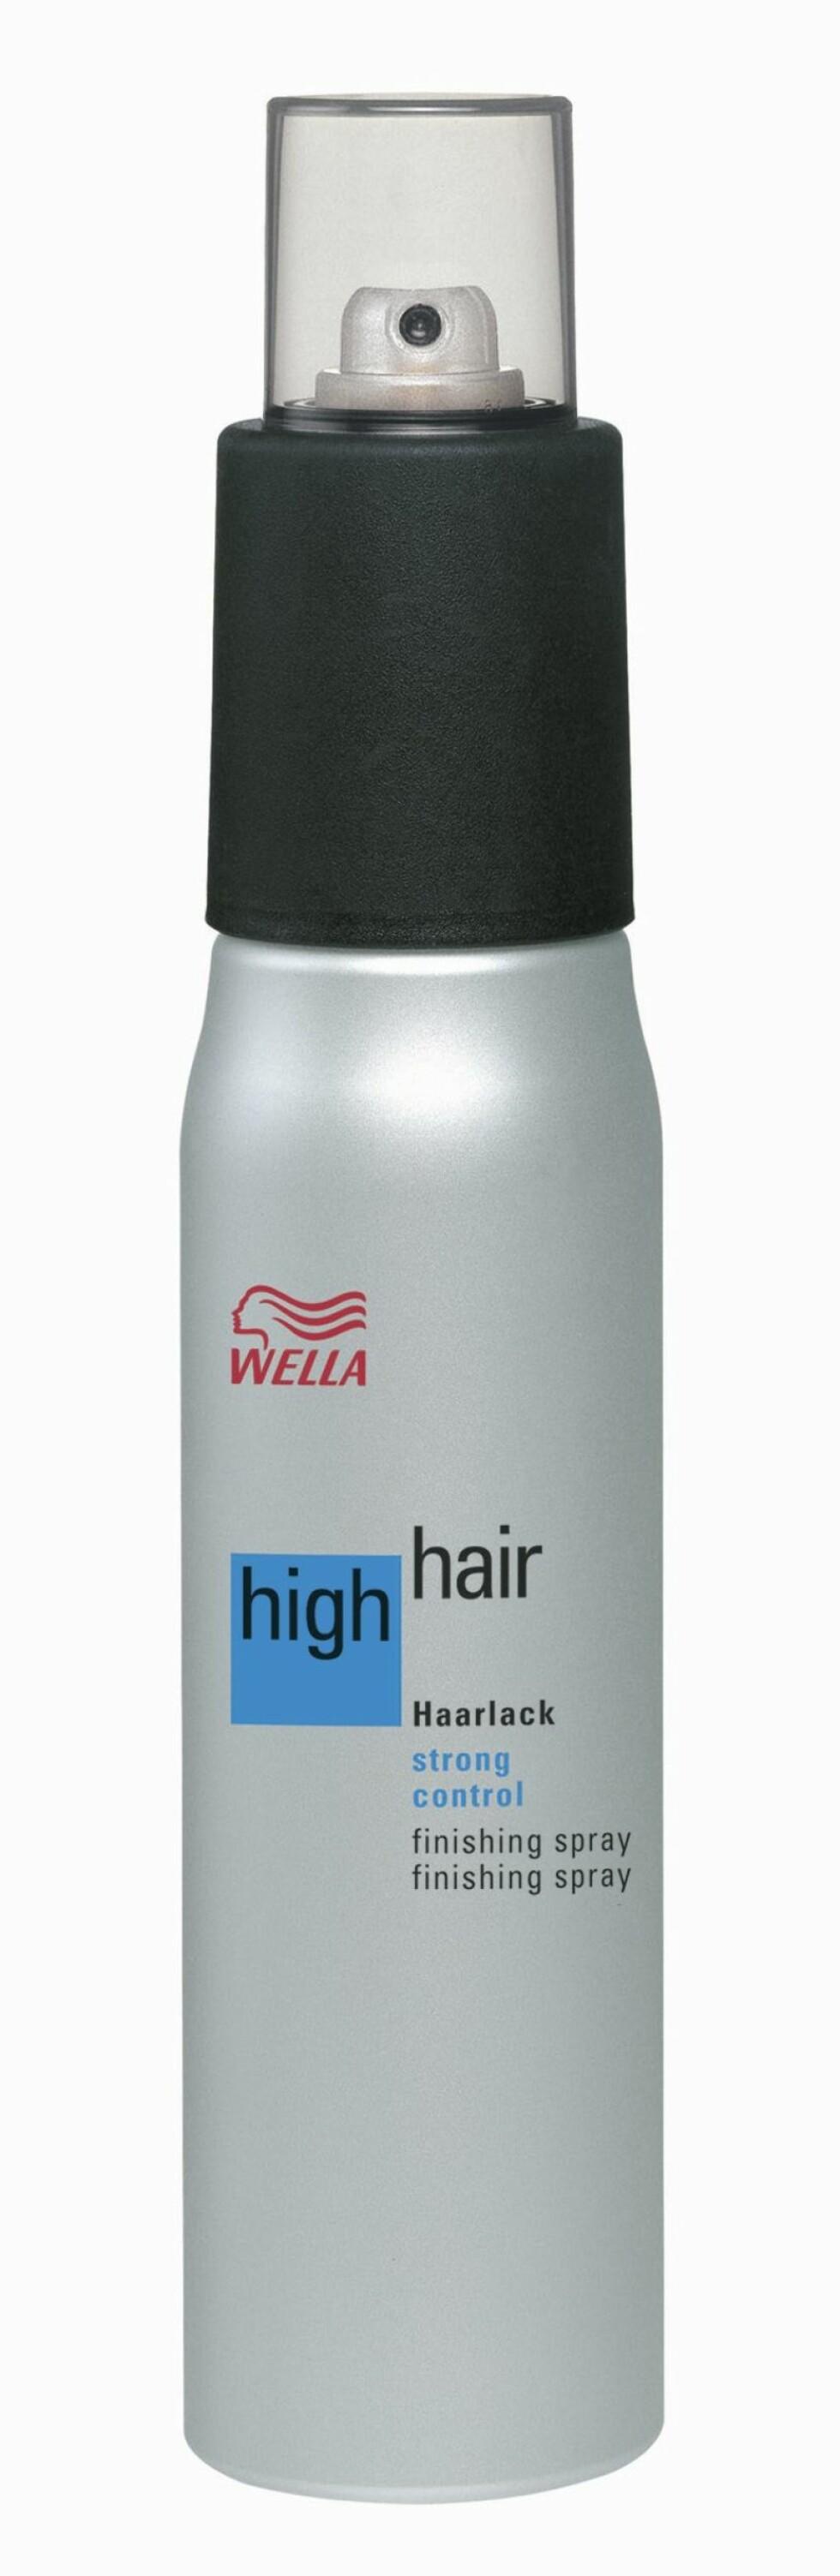 High Hair Finishing Spray Srong Control 300 ml, fra Wella, ca. kr 210. Foto: Produsenten